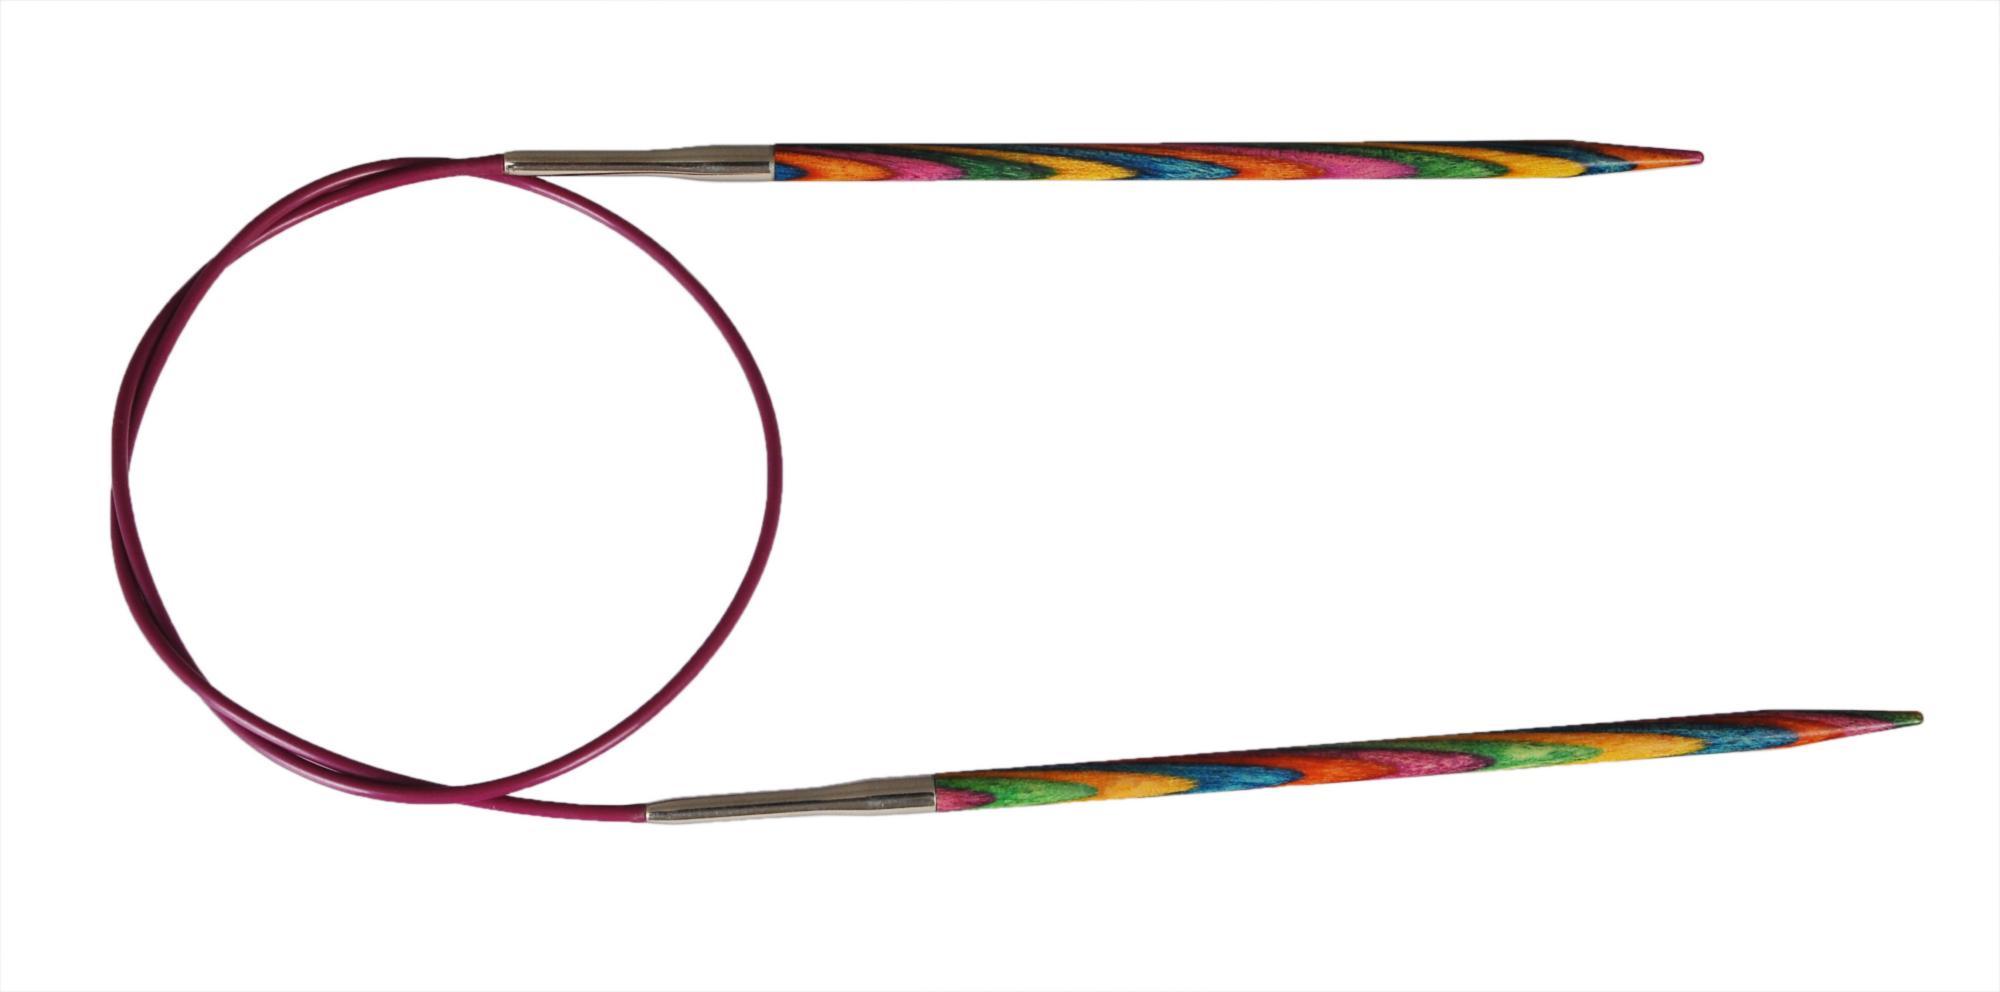 Спицы круговые 100 см Symfonie Wood KnitPro, 21359, 8.00 мм